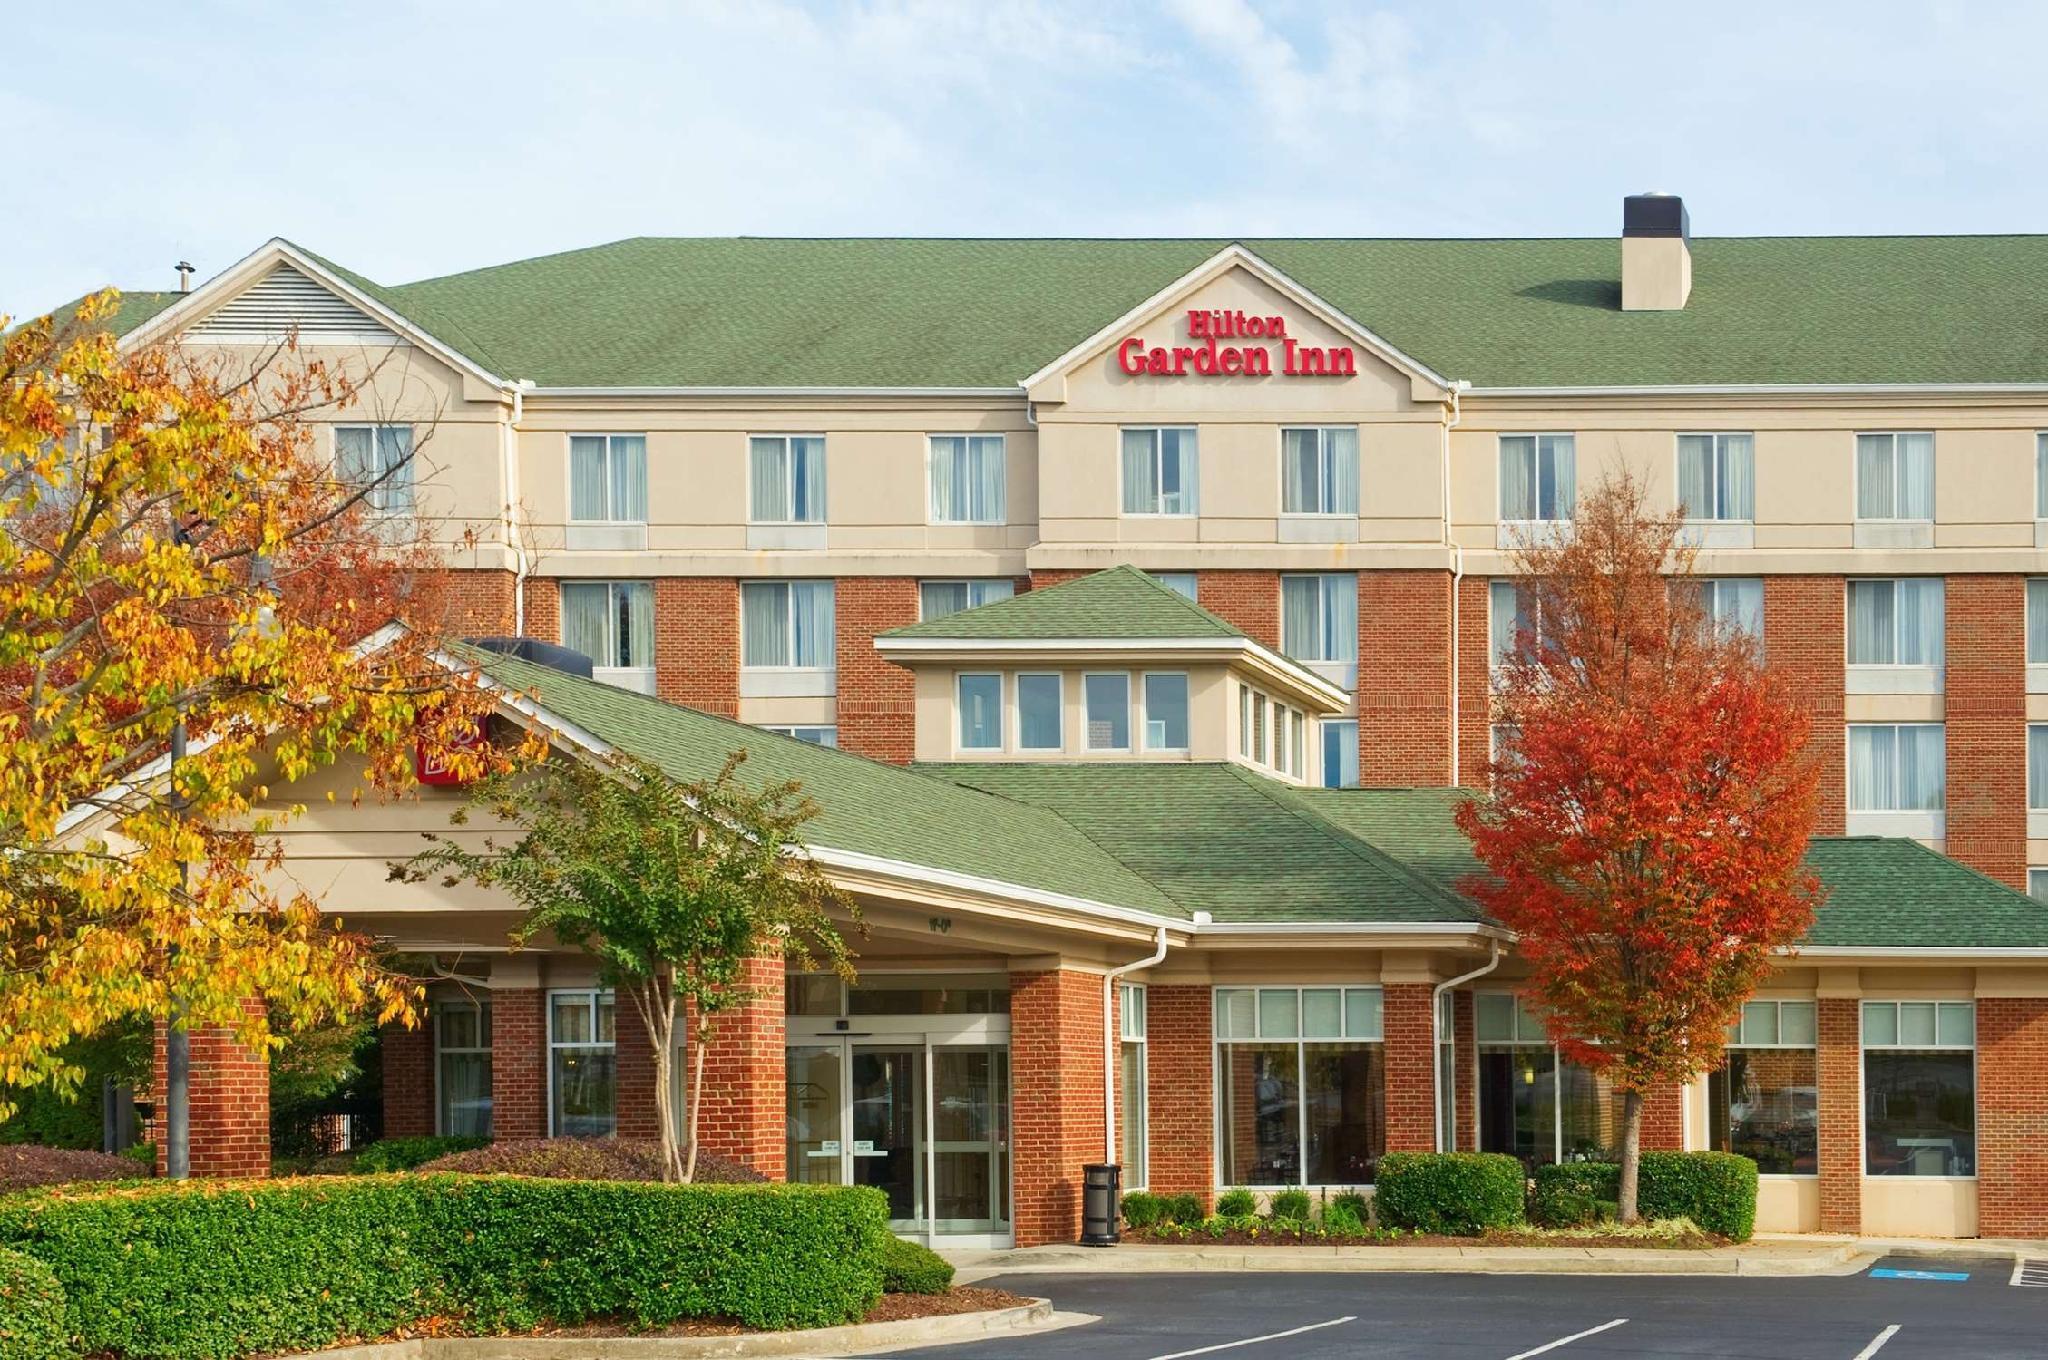 Hilton Garden Inn Atlanta North Johns Creek